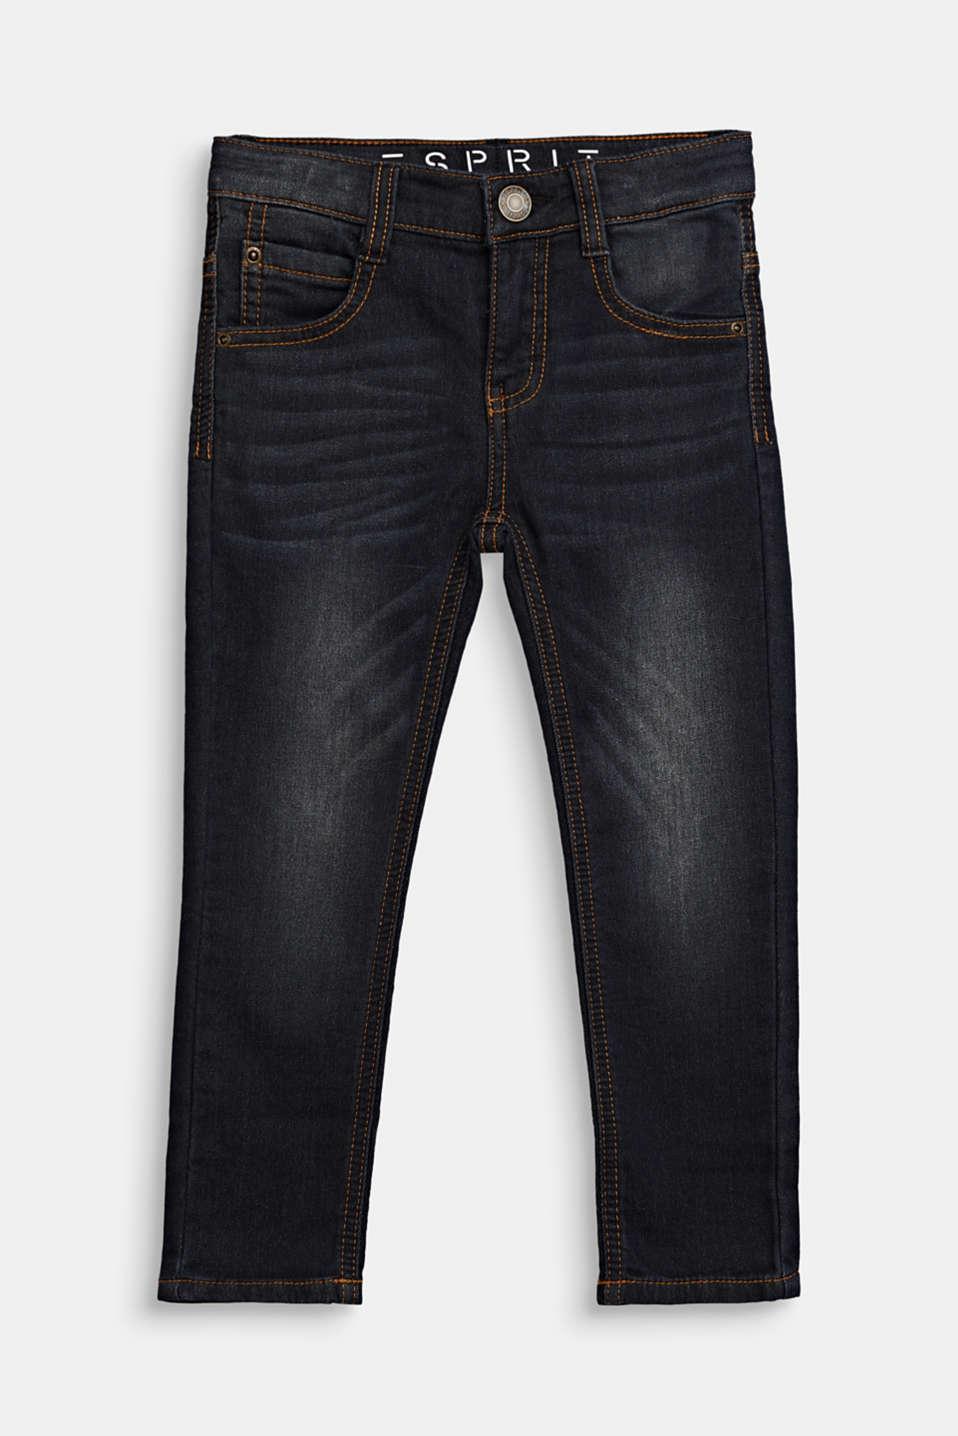 Jeans in comfy tracksuit fabric, adjustable waistband, BLACK DENIM, detail image number 0